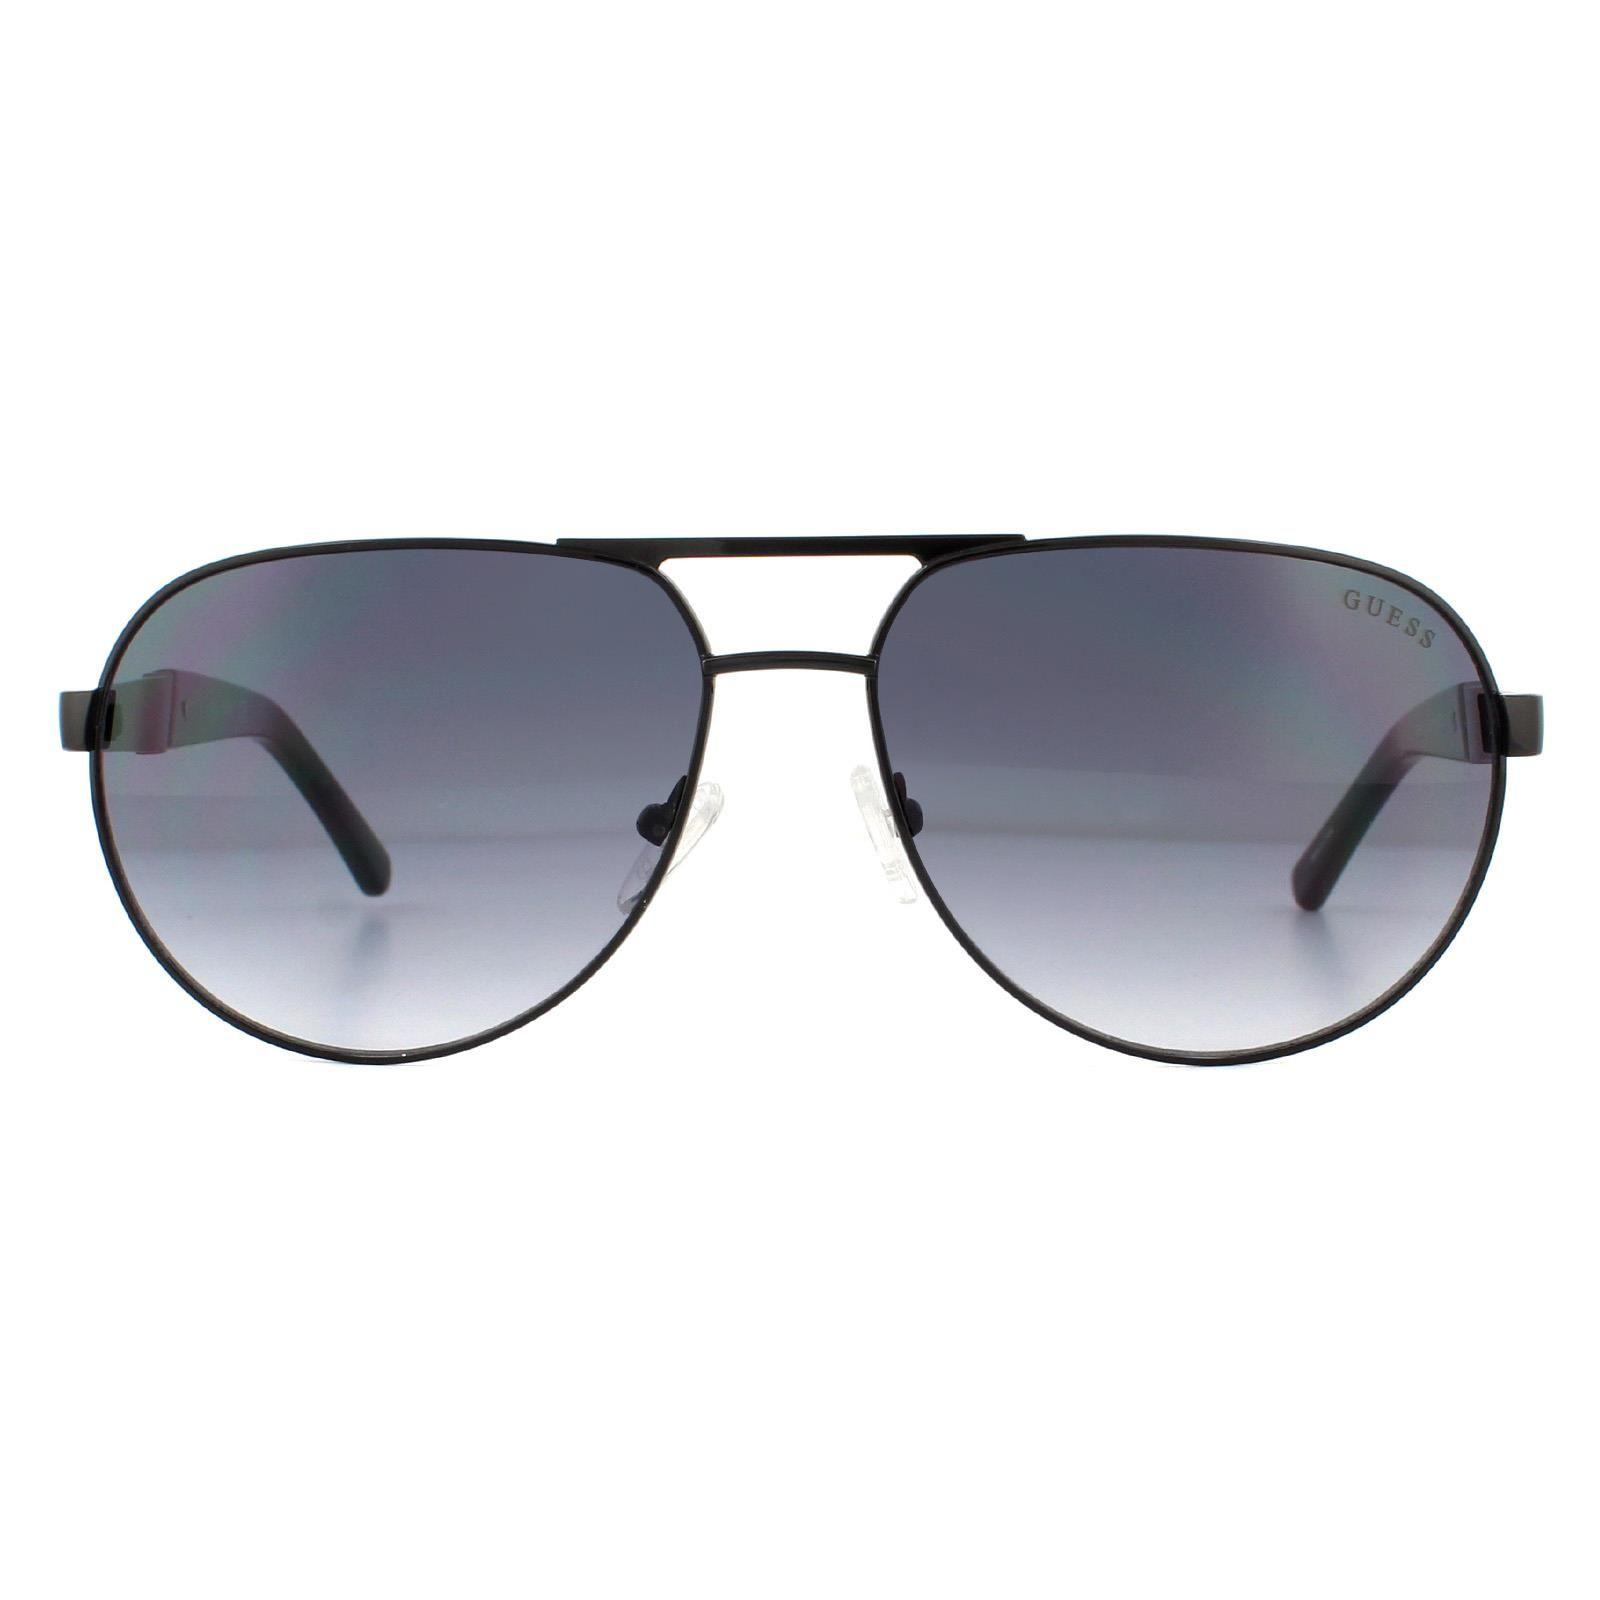 Guess Sunglasses GF5031 01B Black Grey Gradient